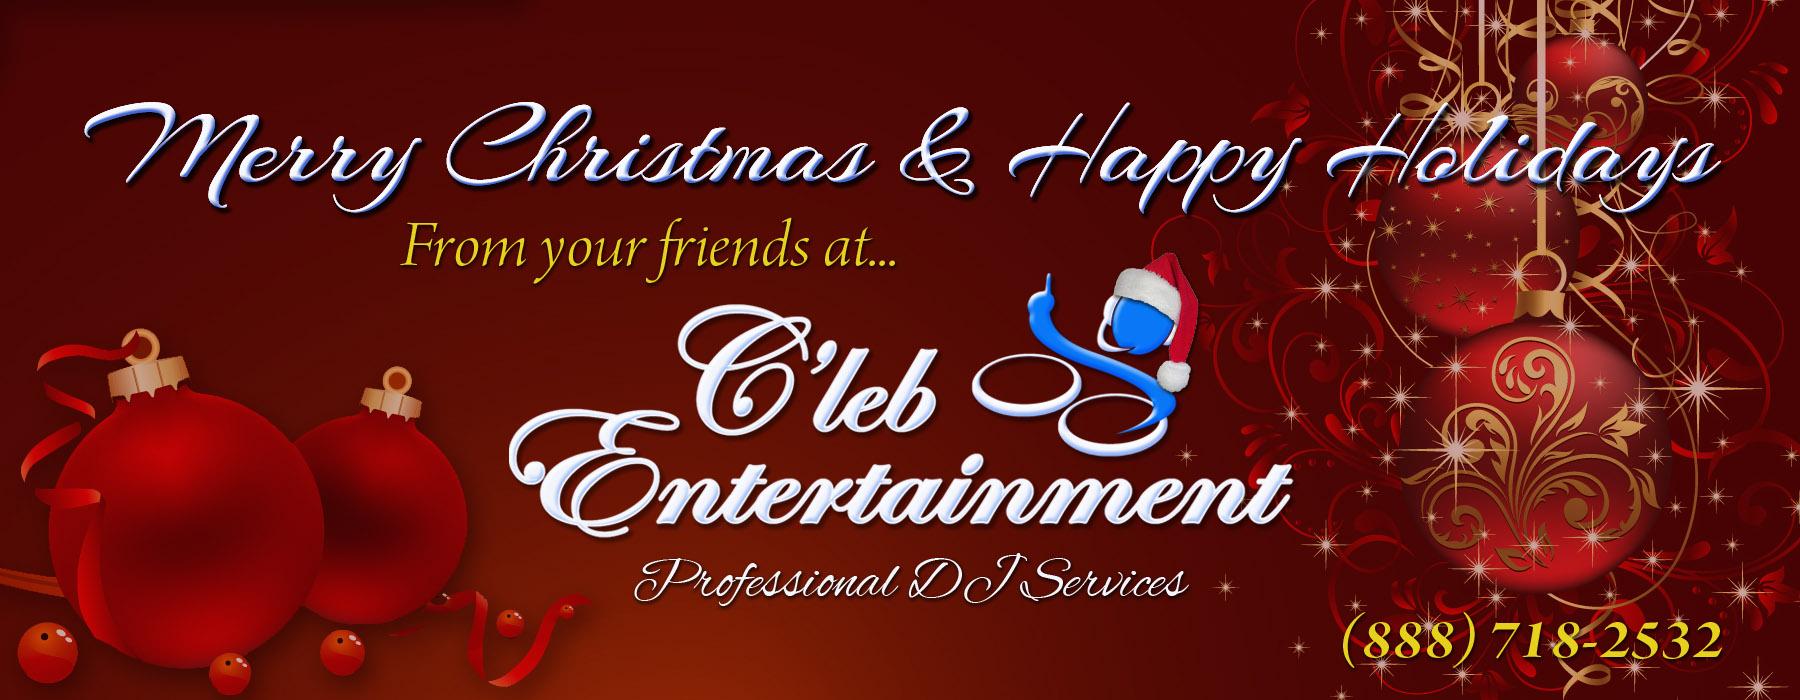 Cleb Entertainment Seasons Greetings To All